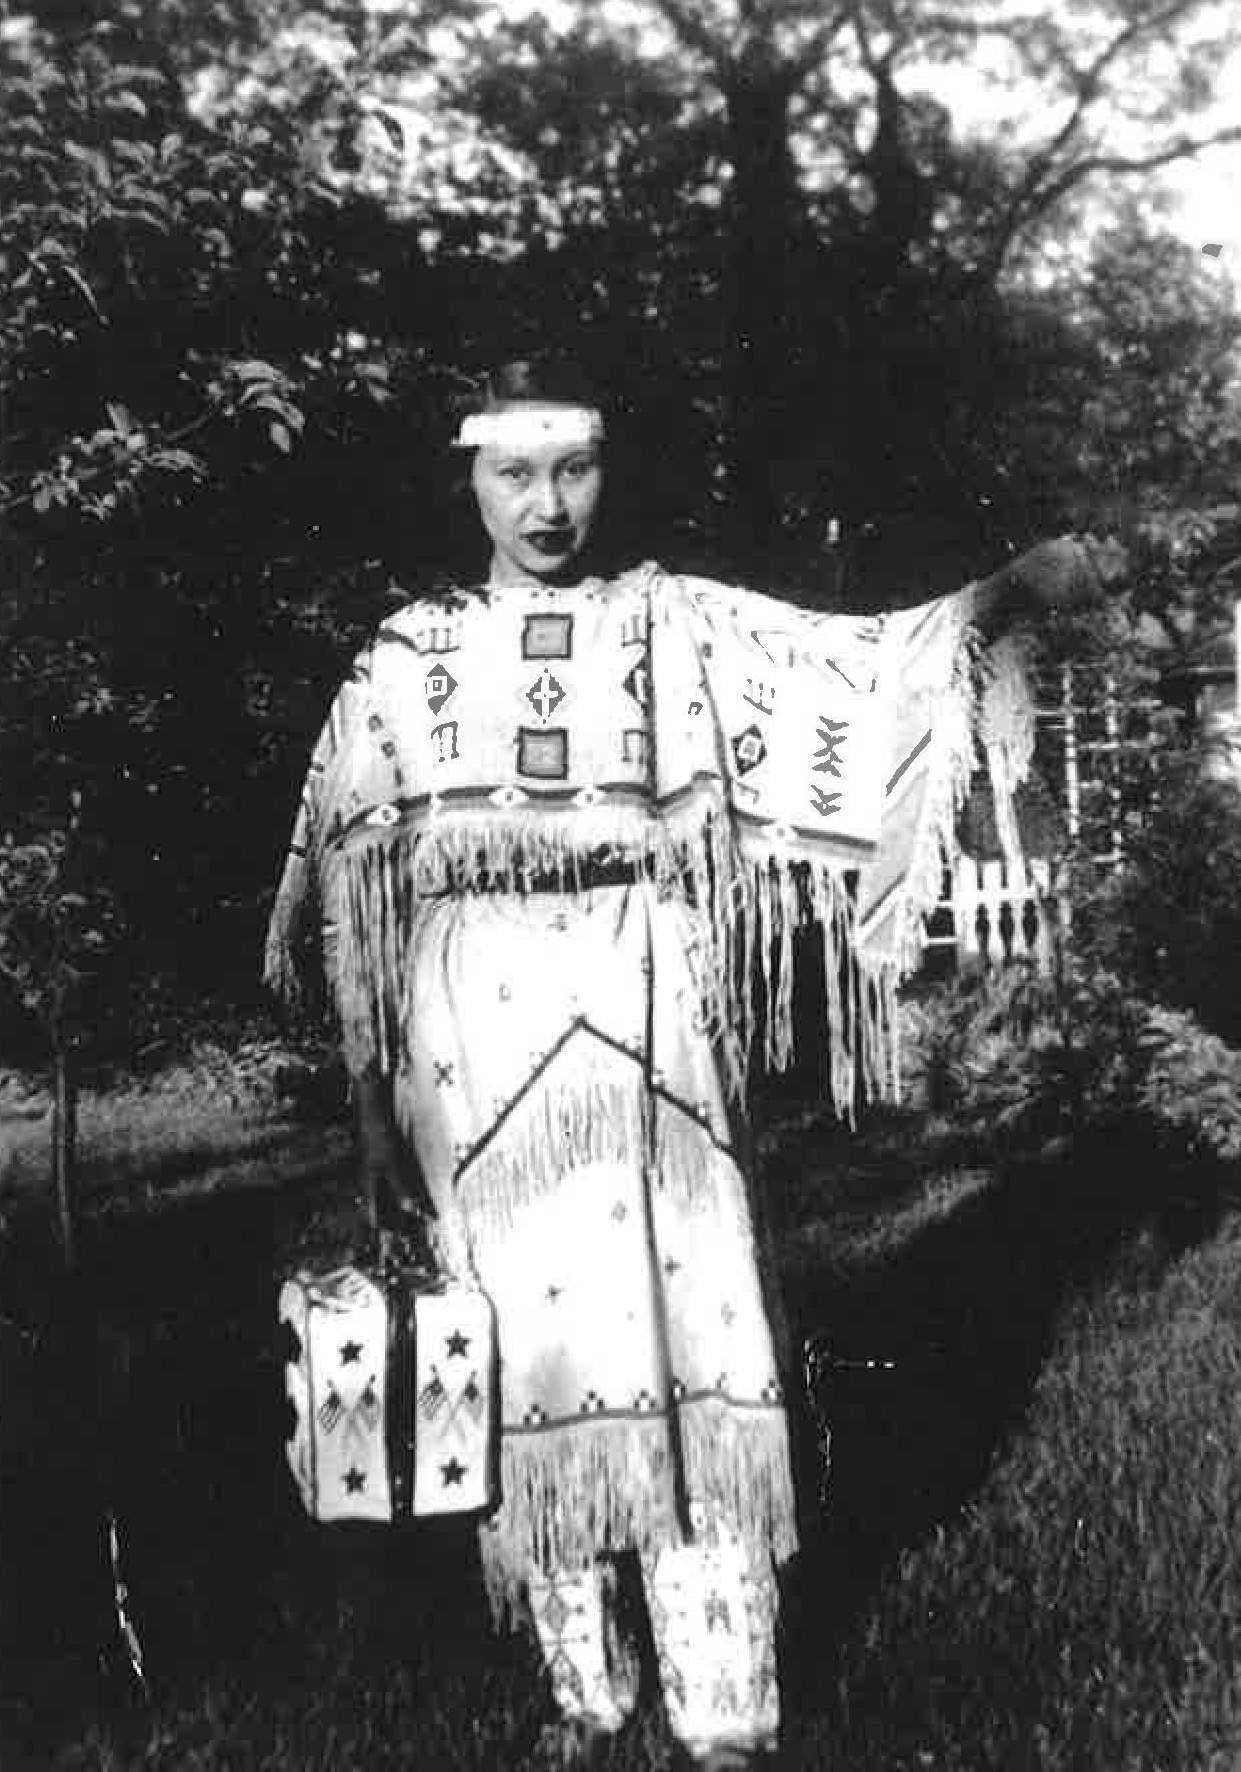 Edna Elizabeth Thomas